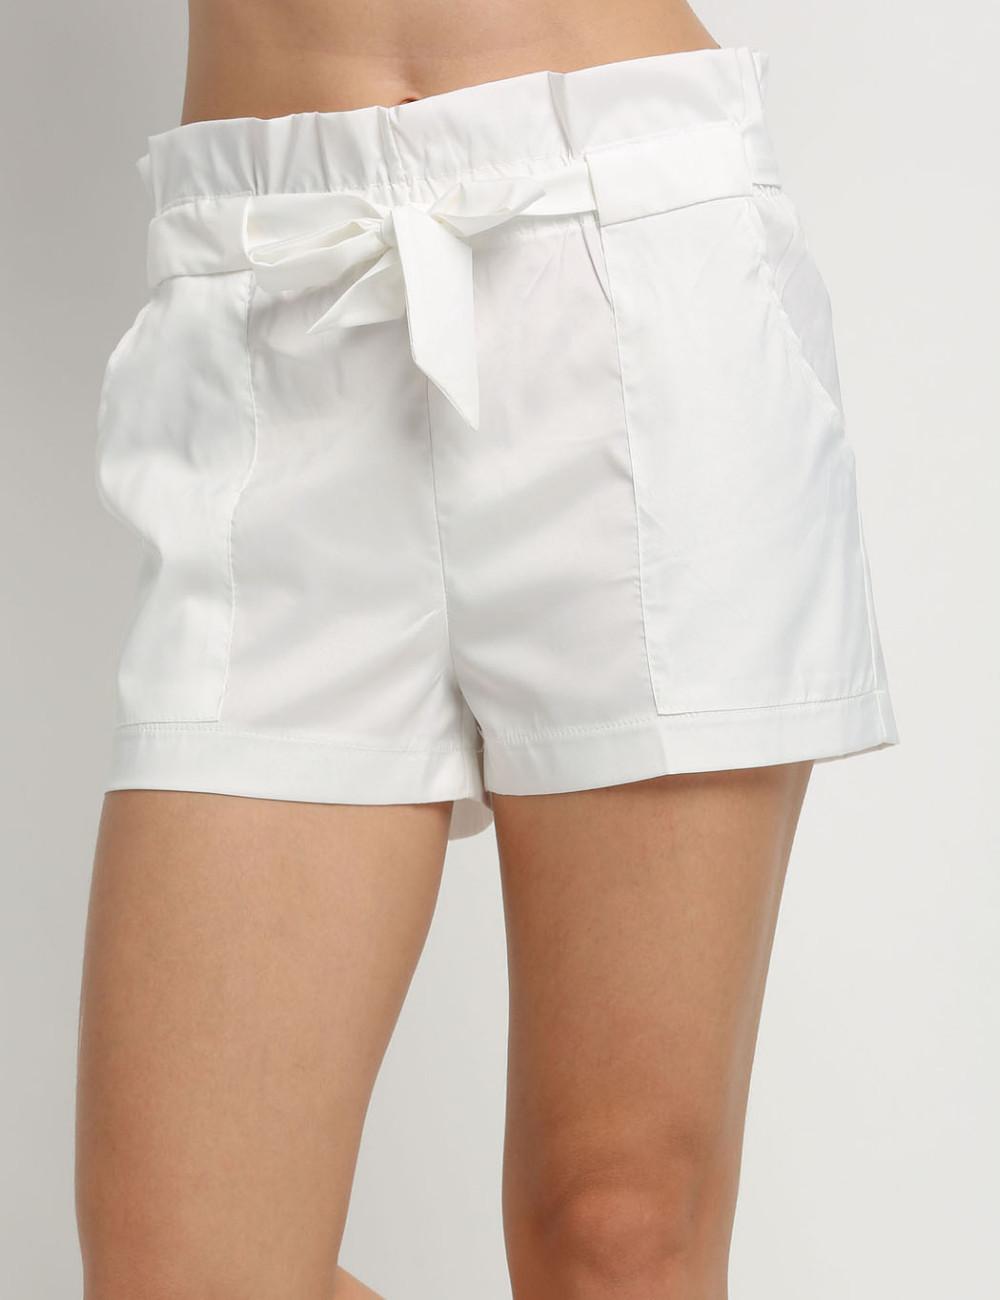 HTB1D4wINFXXXXaOXFXXq6xXFXXXT - High Waist Shorts Loose Shorts With Belt Woman PTC 59